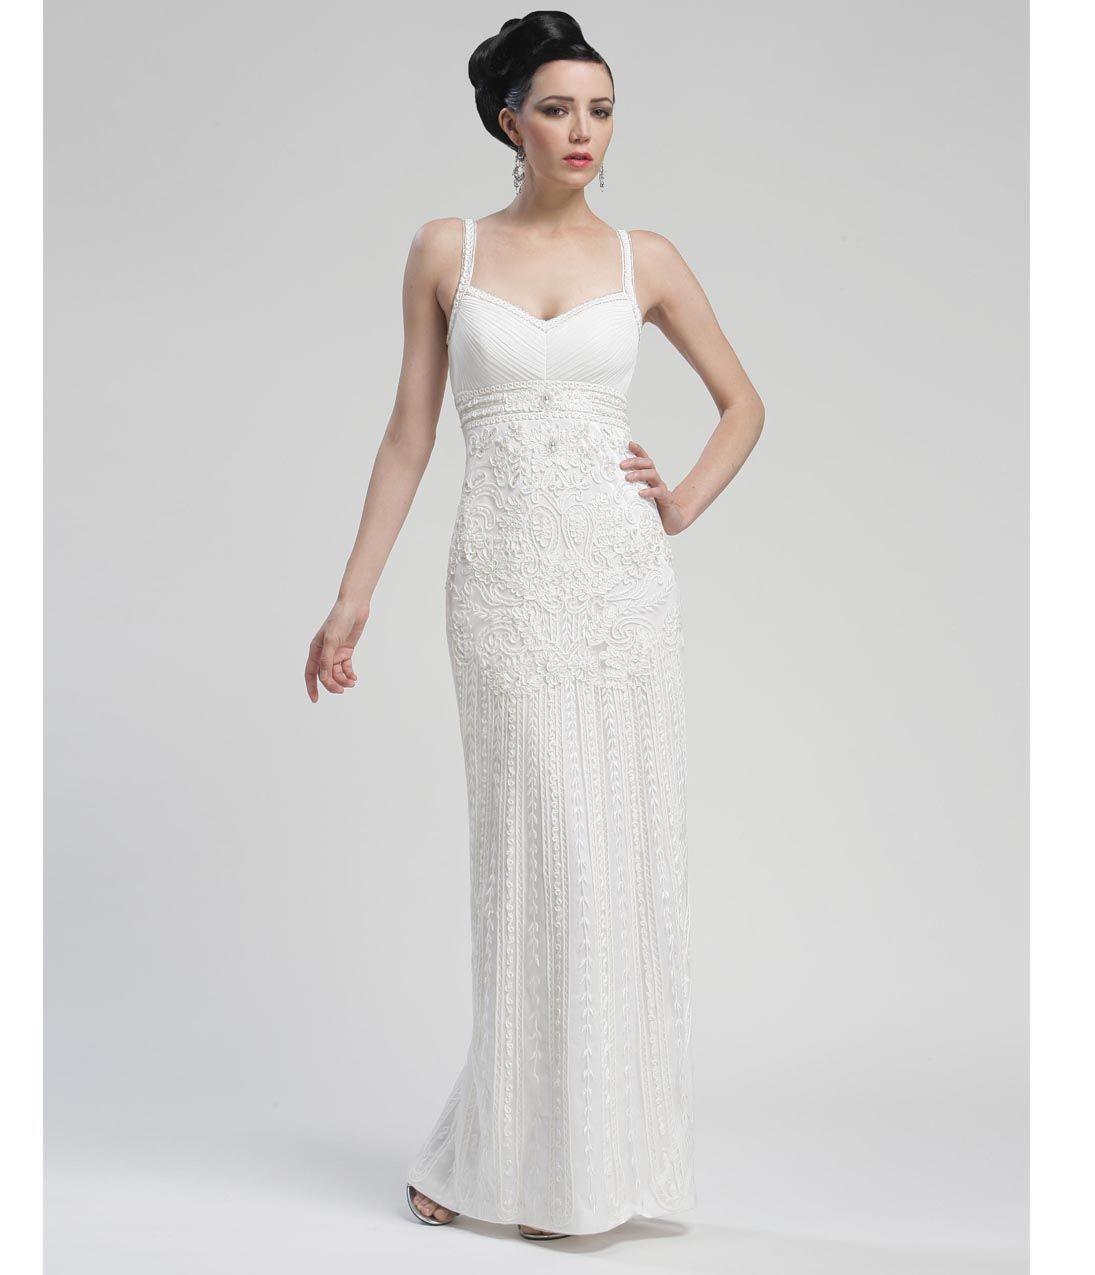 stop staring s style navy u ivory railene dress sue wong